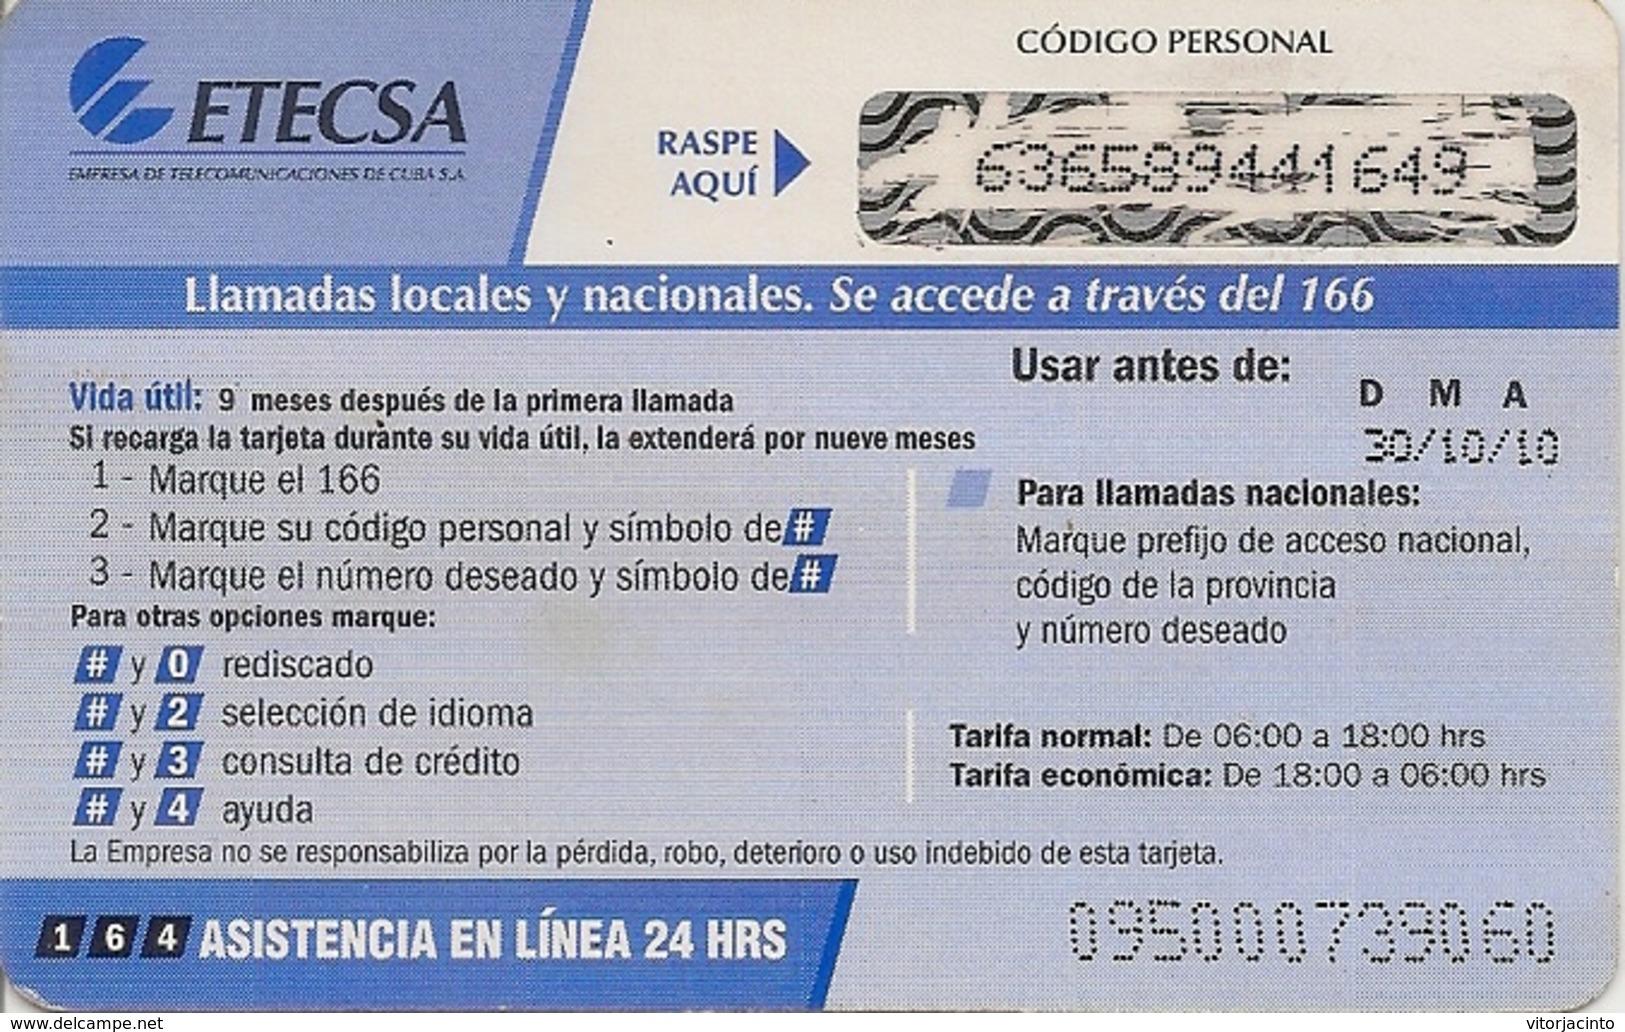 ETECSA Propia- Local And NationaL Phone Card Recharge 10.00 MN - Cuba - Cuba